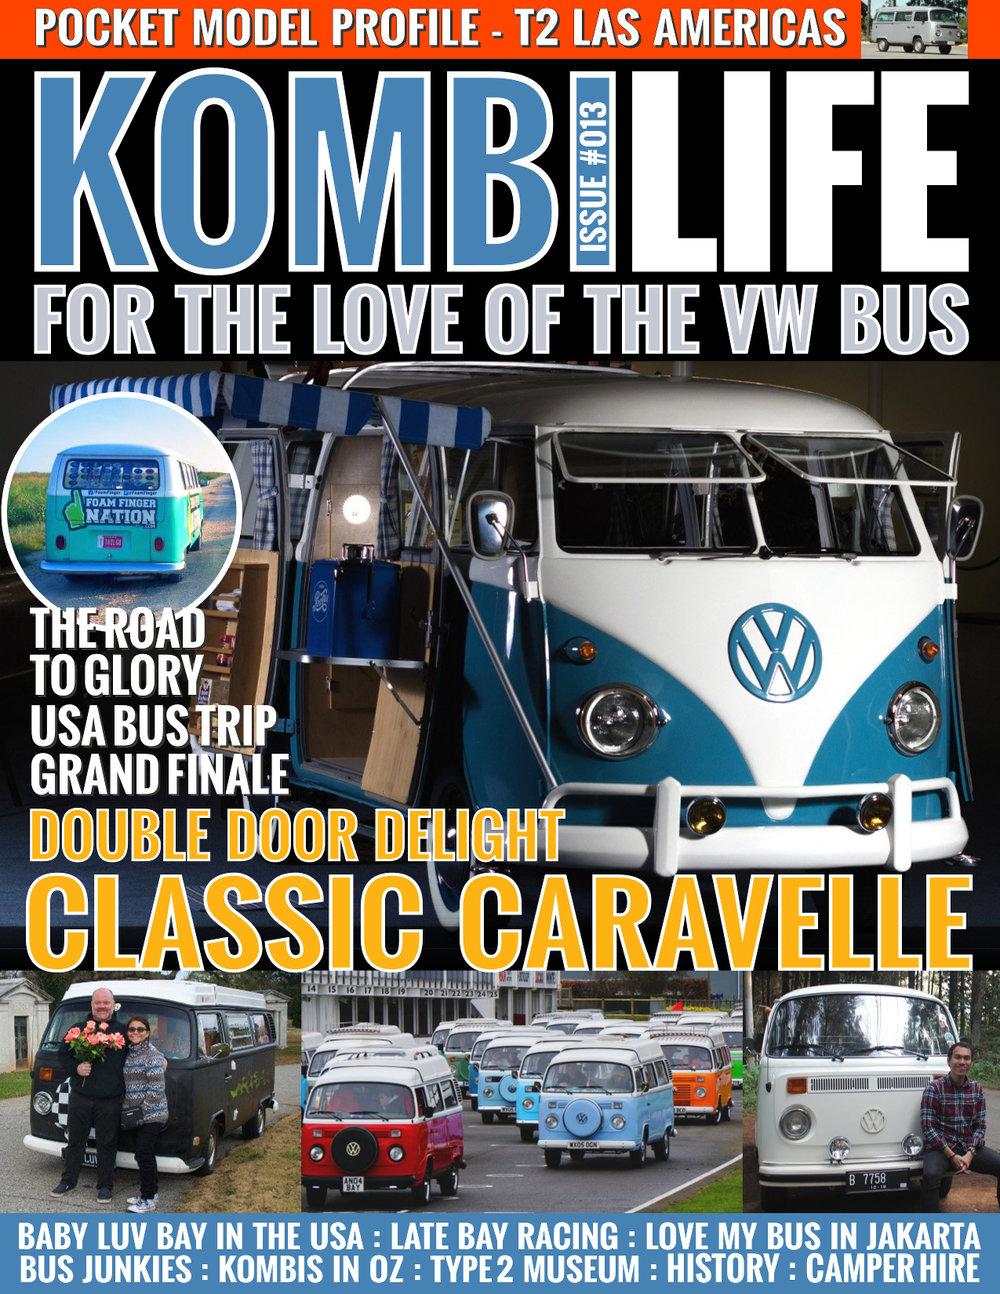 Rob KL Cover.jpg